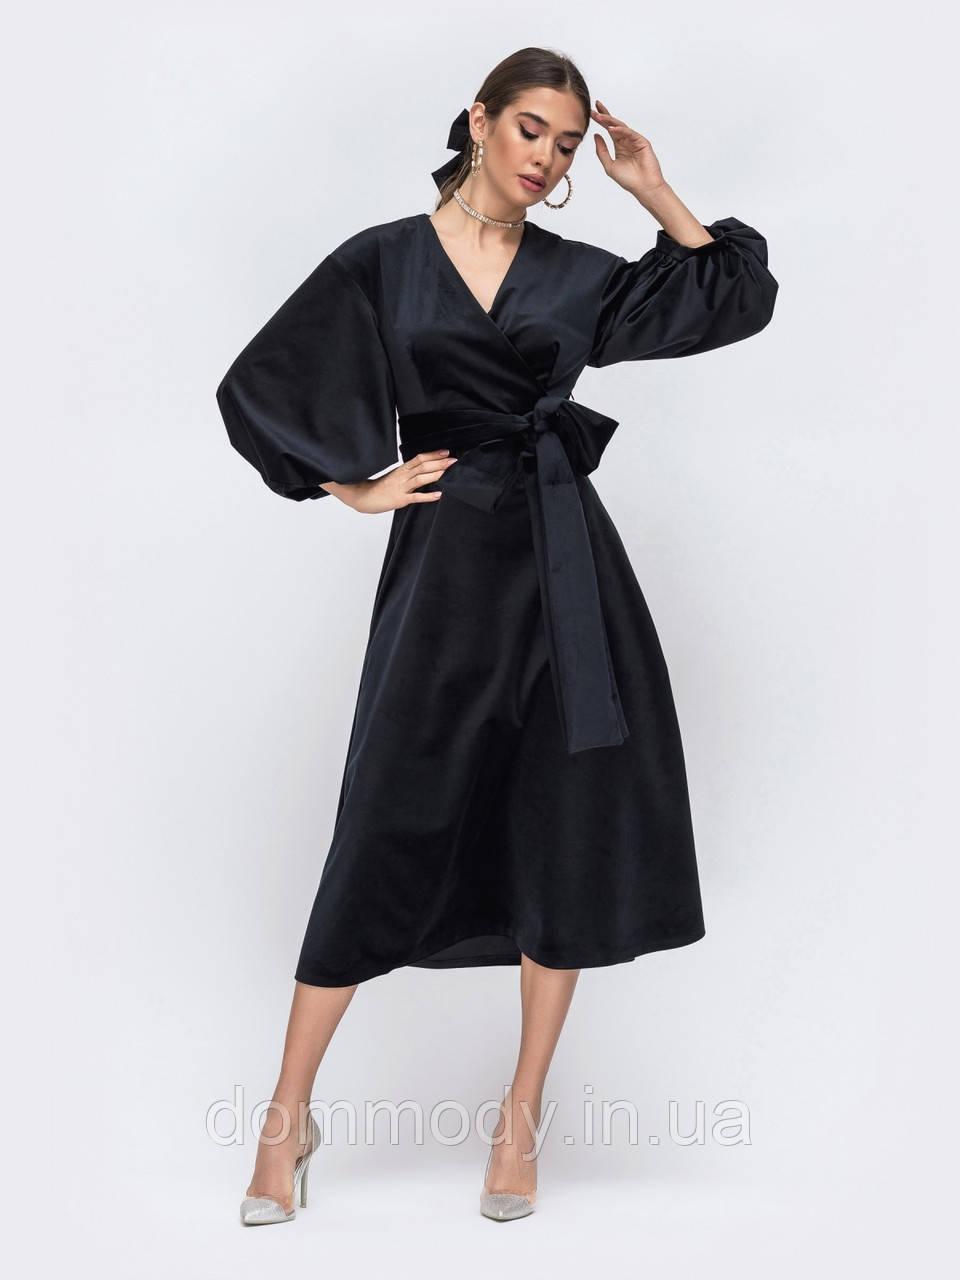 Платье женское Melissa black